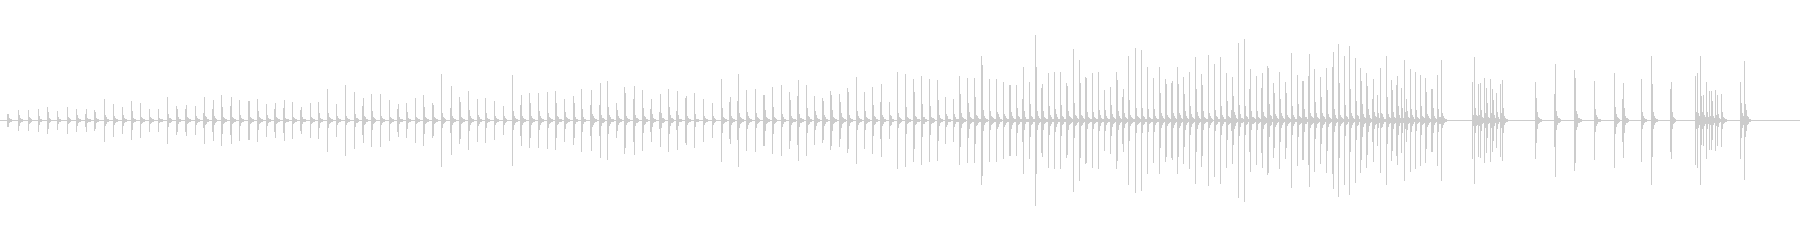 木琴11歌舞伎黒御簾下座音楽和風日本マリの未再生の波形